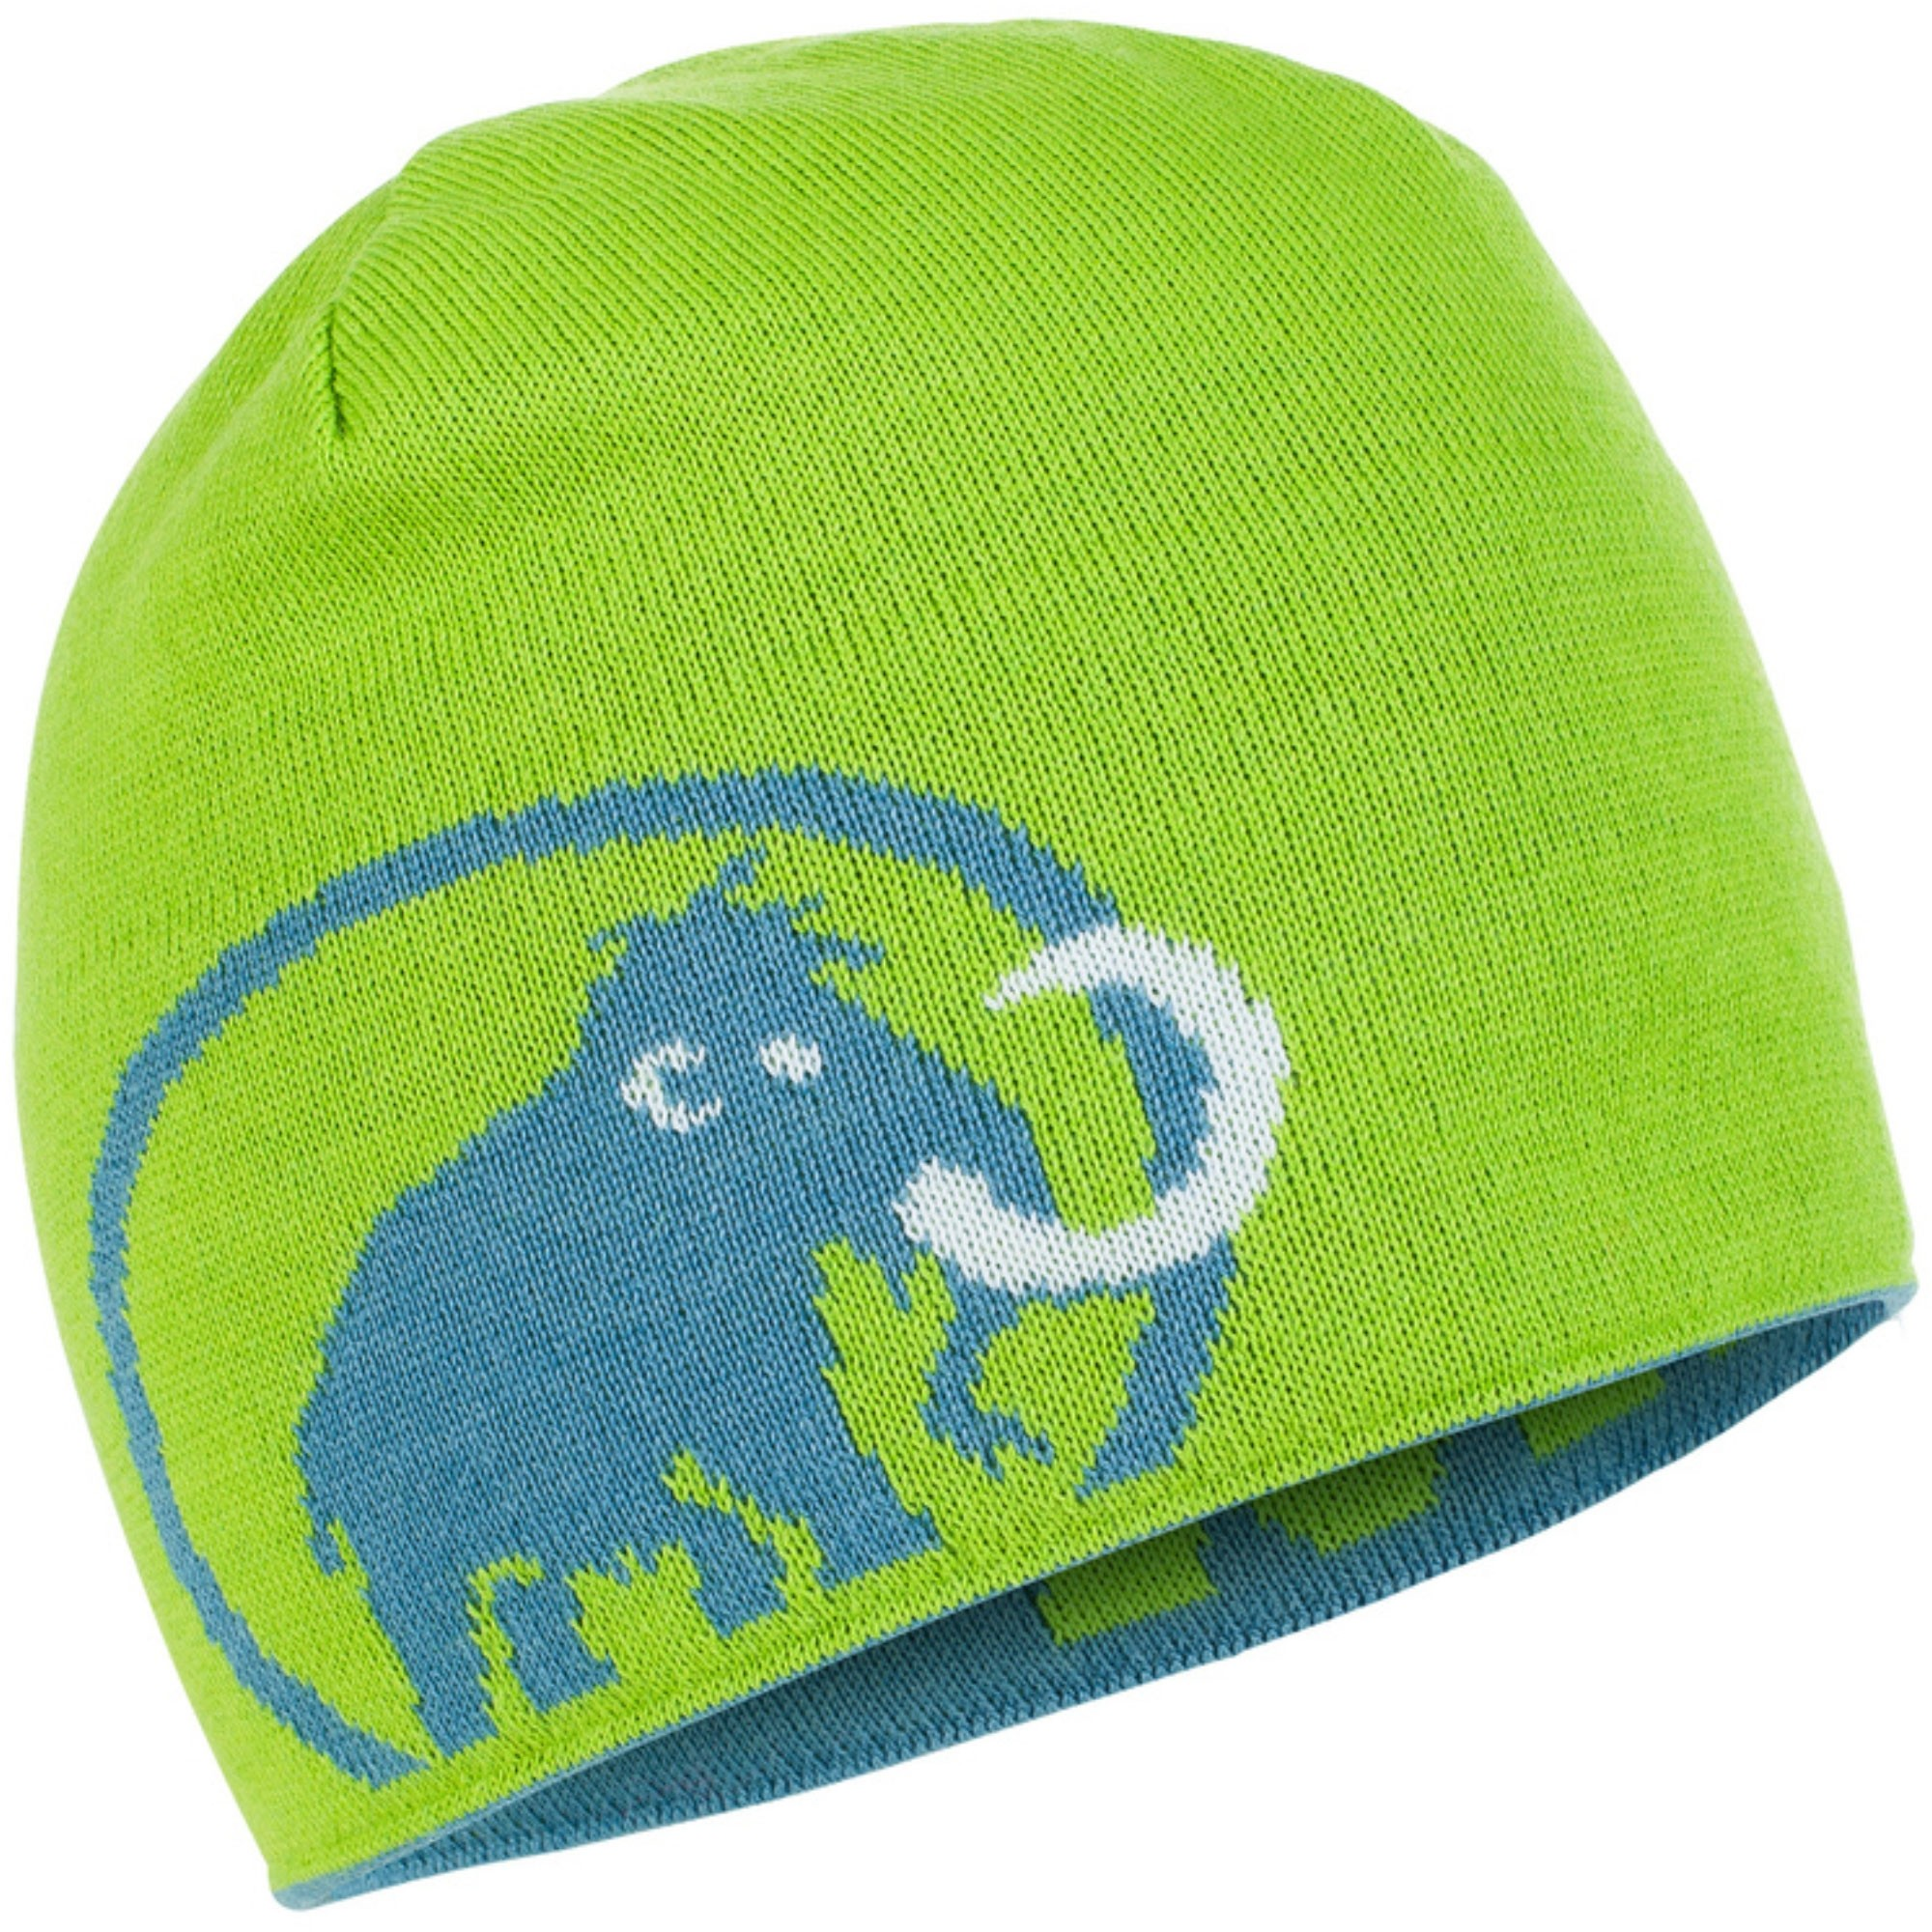 Mammut Logo Beanie - Cloud/Sprout